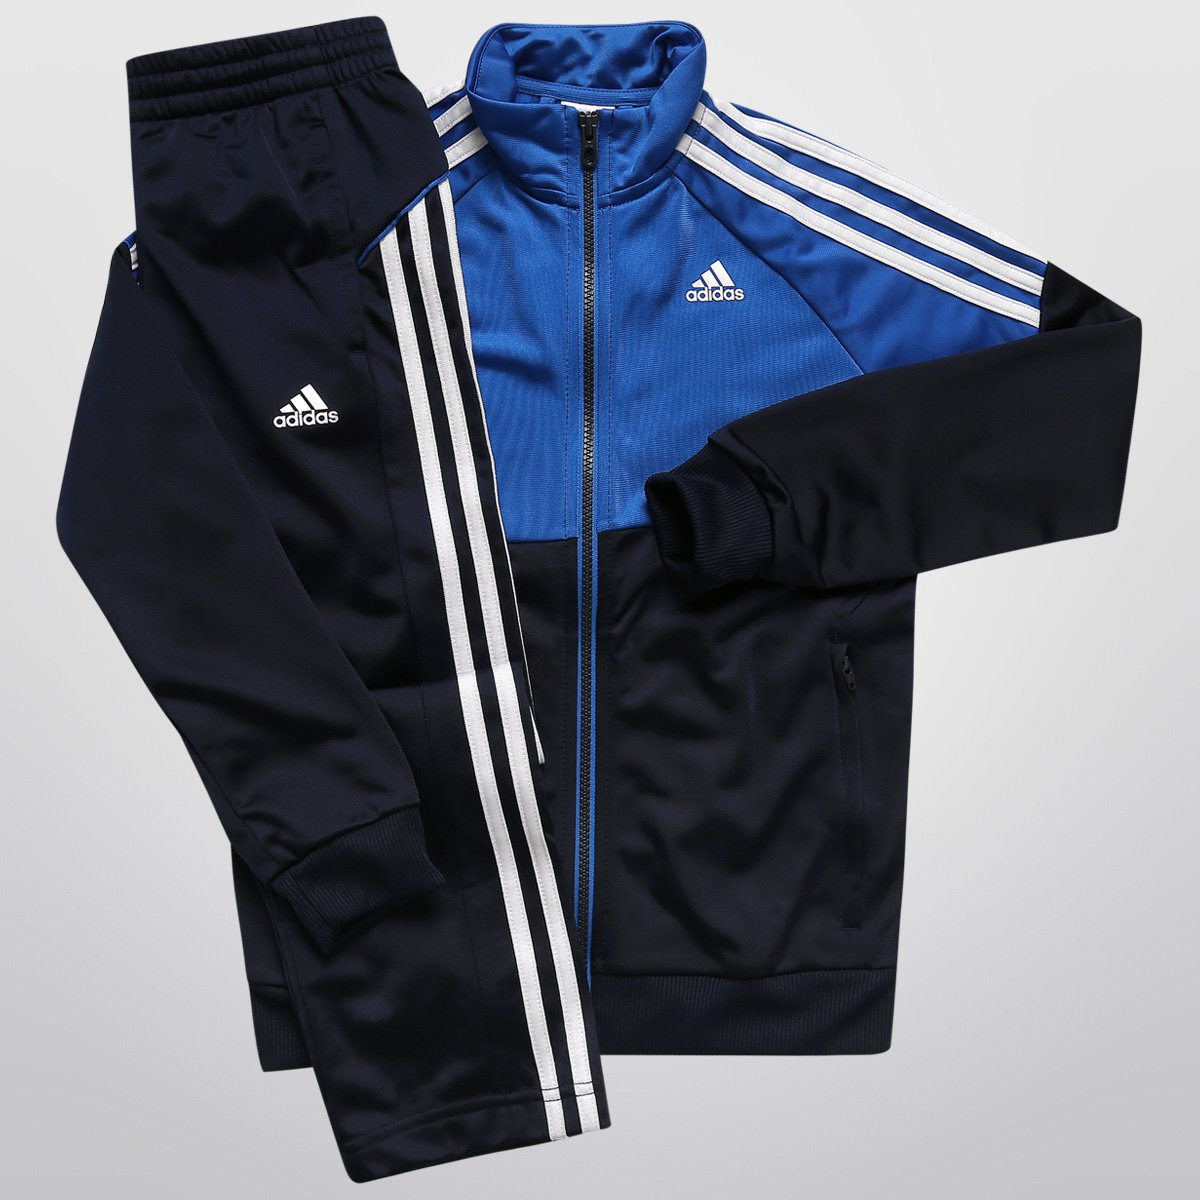 Agasalho Adidas YK TS Gear KN Infantil - Compre Agora  27bbb21d295da